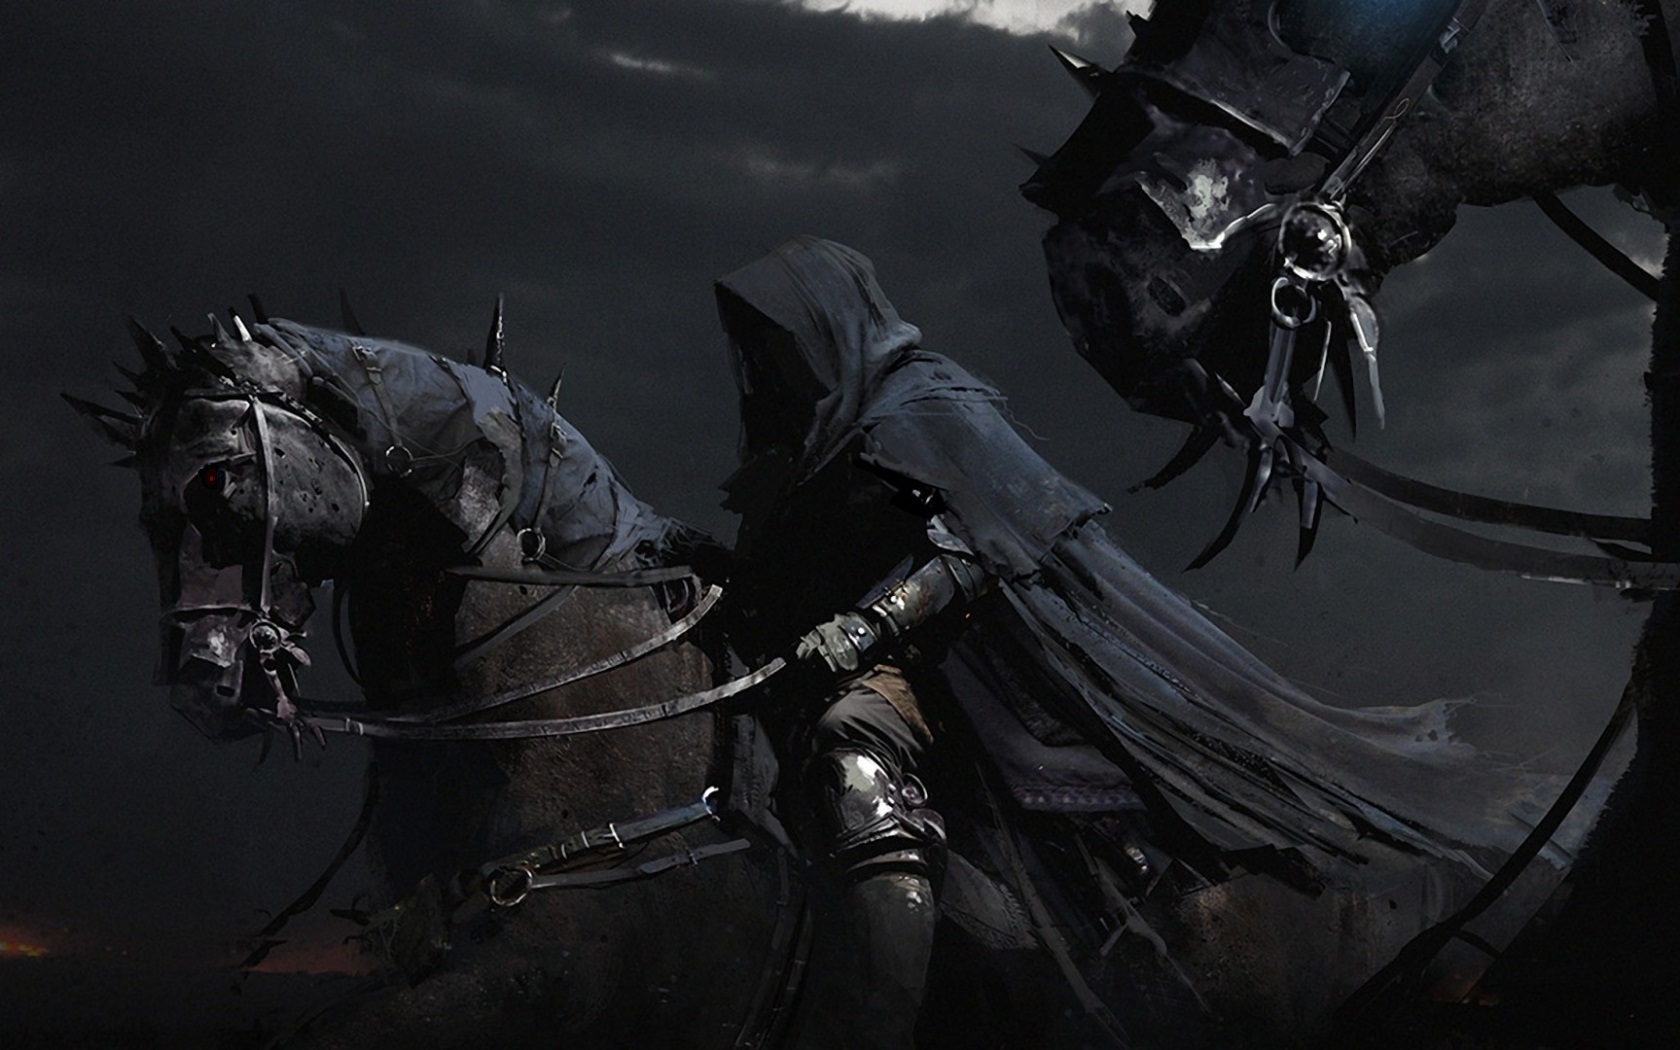 Fantasy art horses nazgul ringwraith lord of the rings online 1920x1080 wallpaper Wallpaper 1680x1050 www.wallmay.net - Copy.jpg